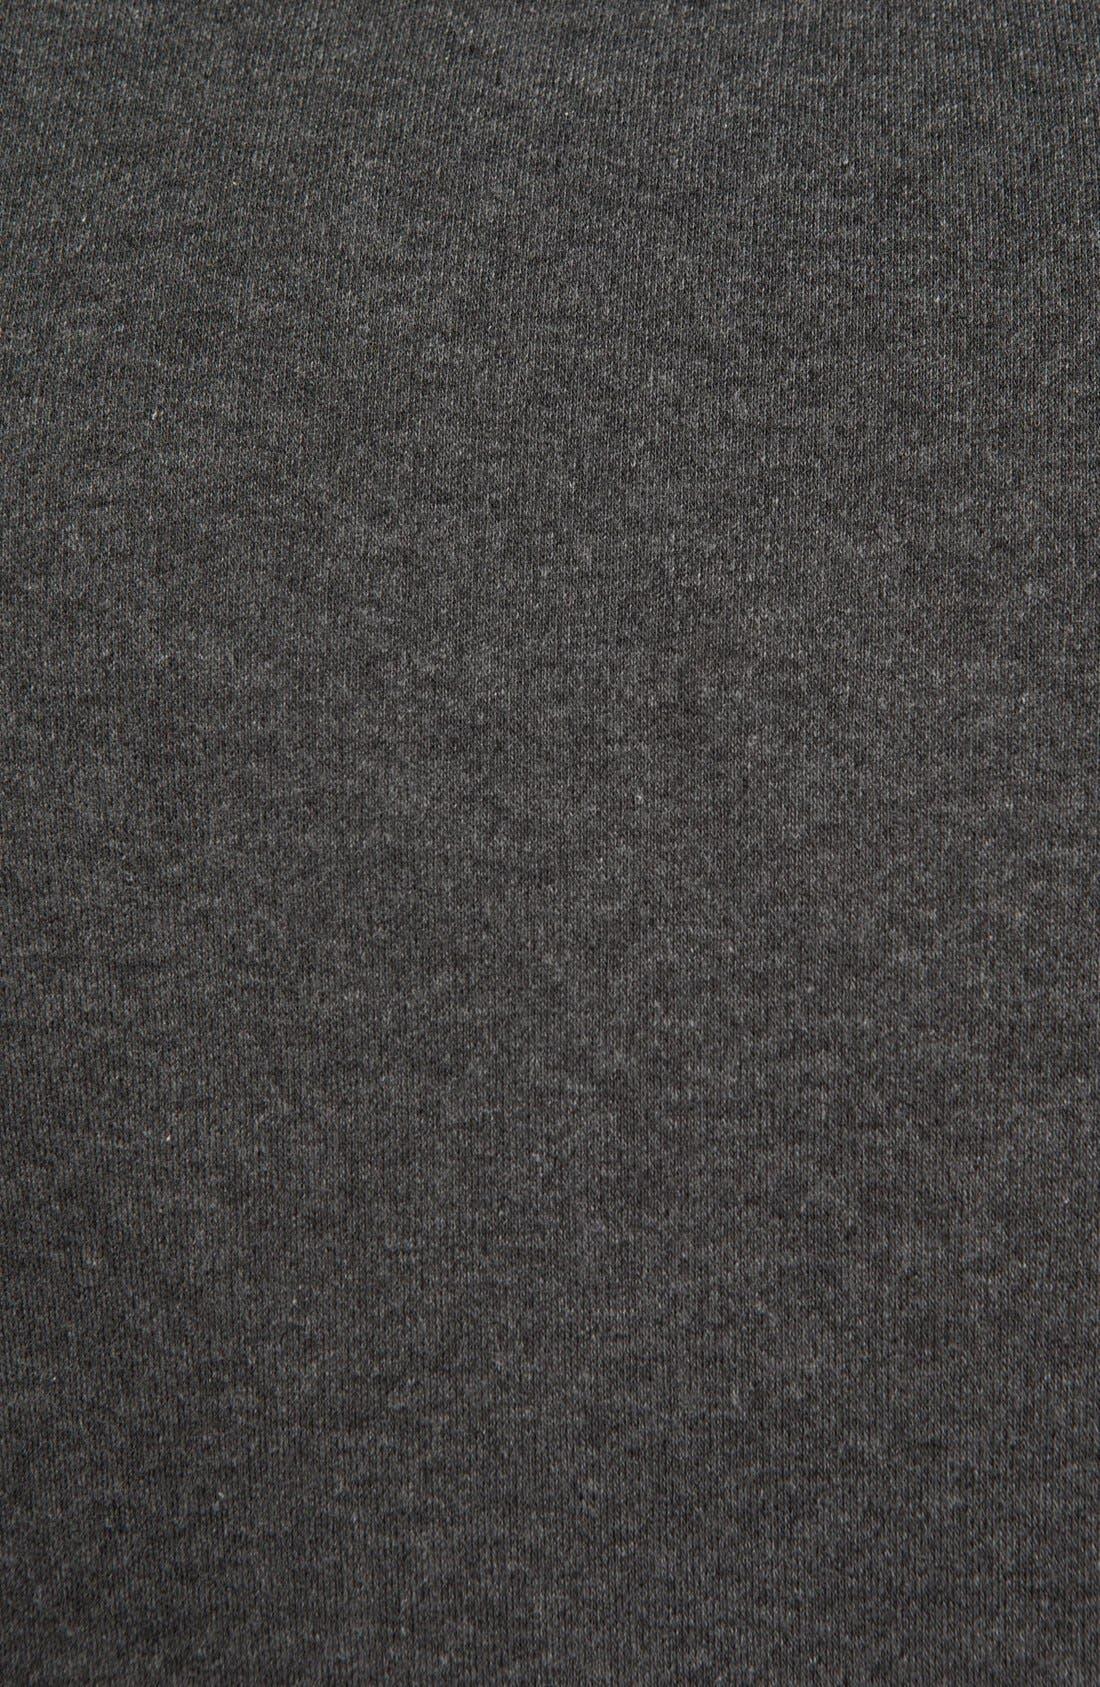 Alternate Image 3  - Ted Baker London 'Norre' Shawl Collar Knit Jersey Cardigan